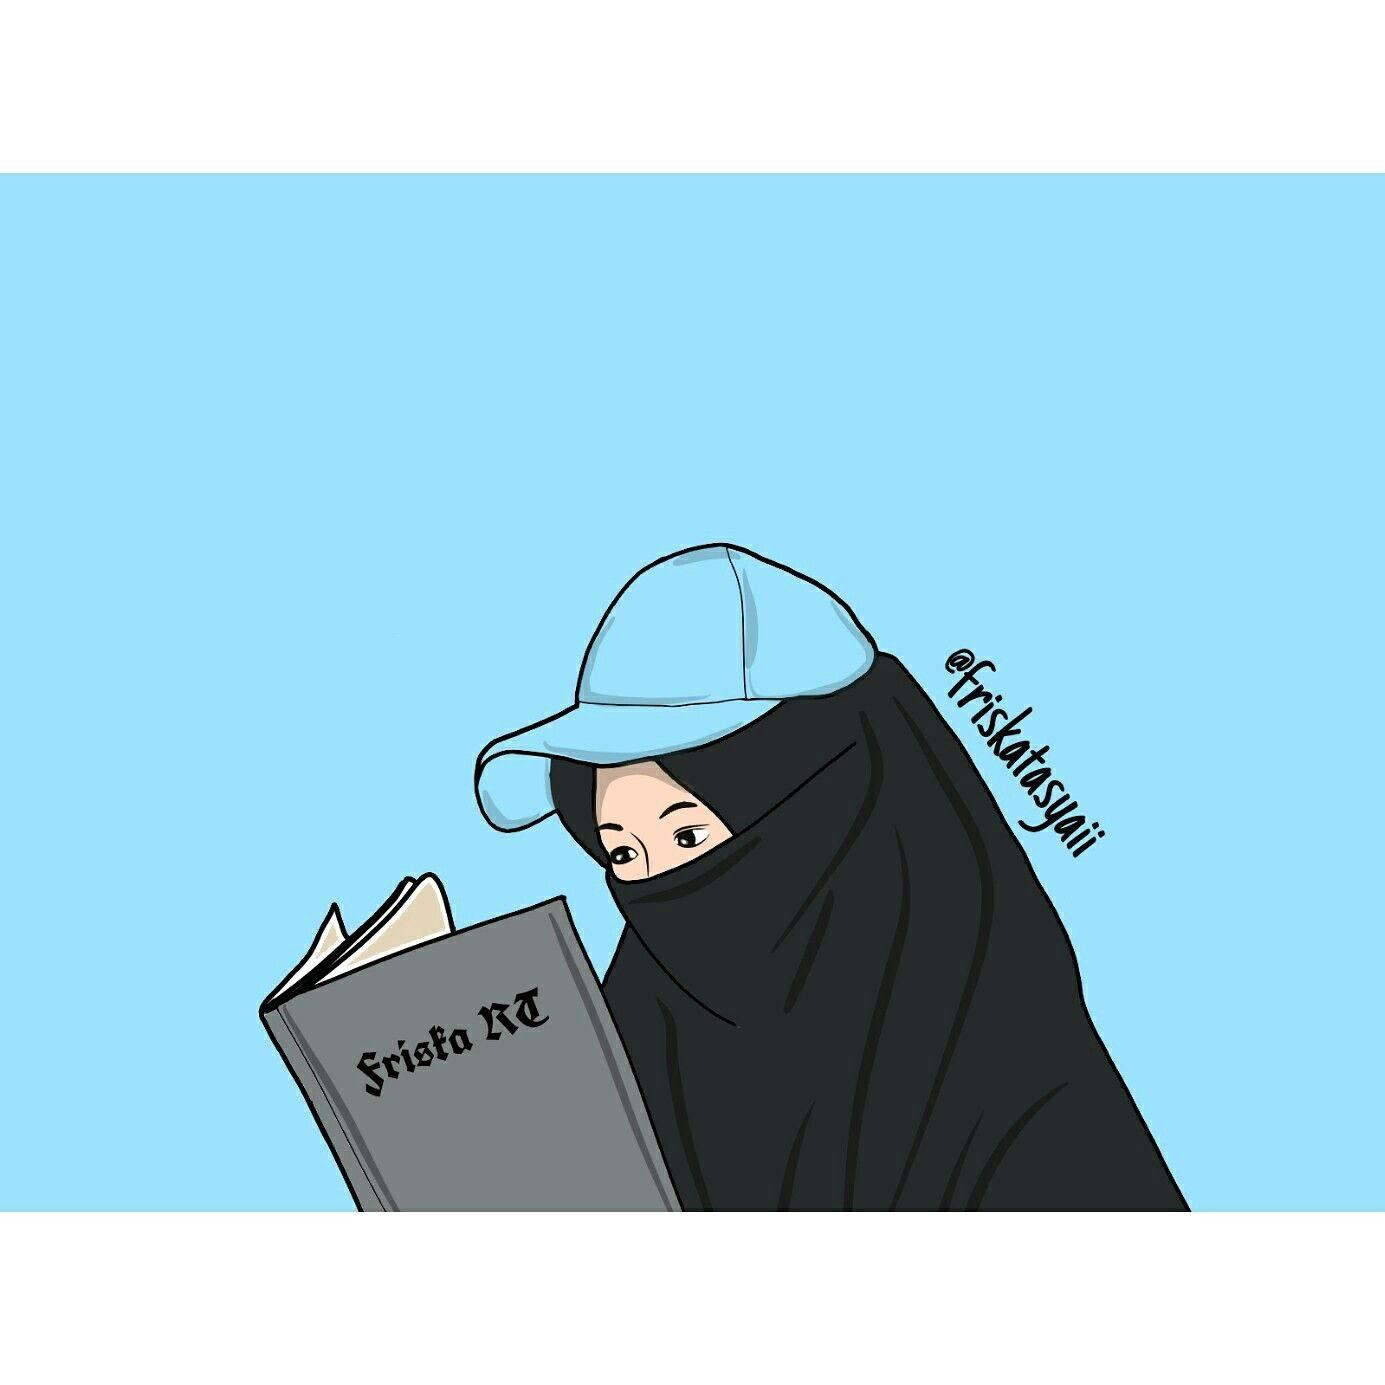 Gambar Kartun Muslimah Berhijab Cantik Bilik Wallpaper